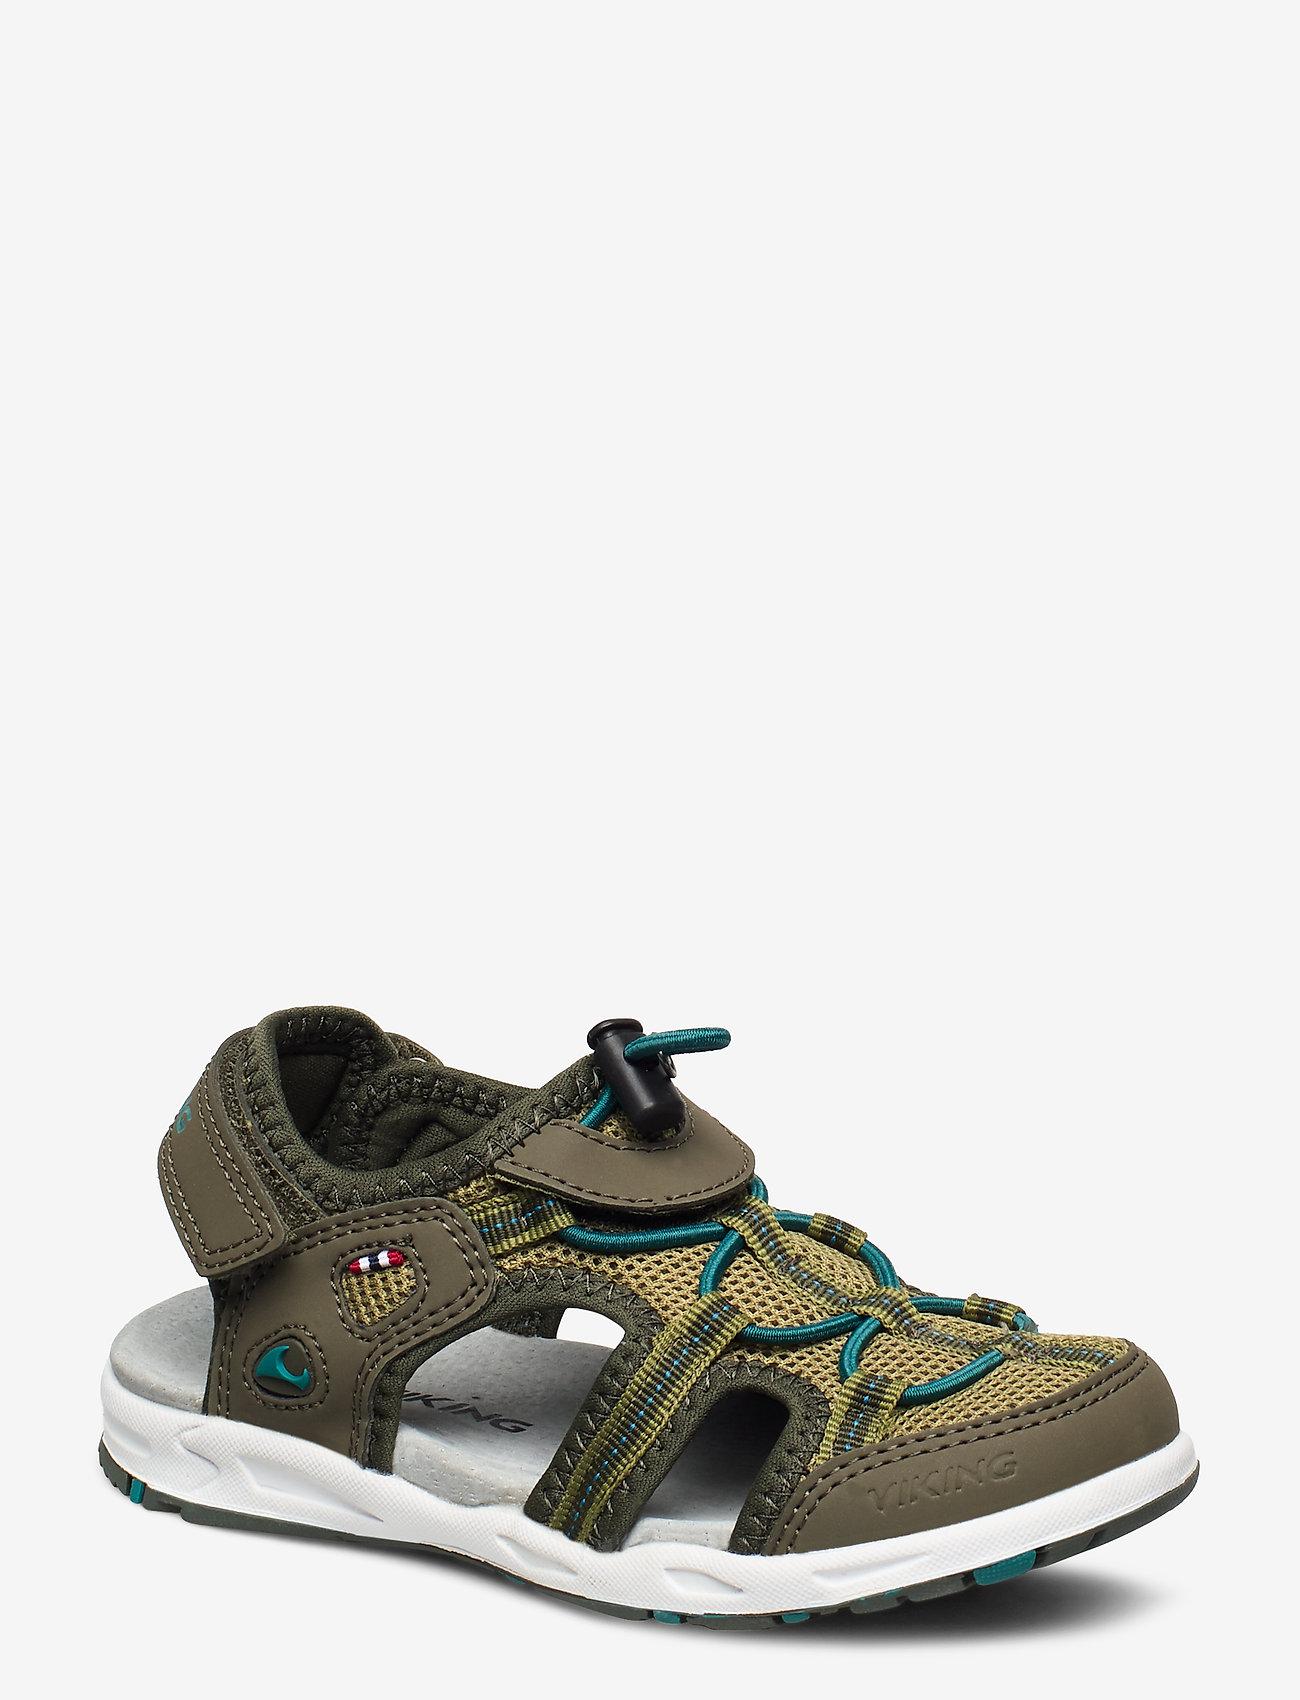 Viking - Thrill - sandals - olive/huntinggreen - 0